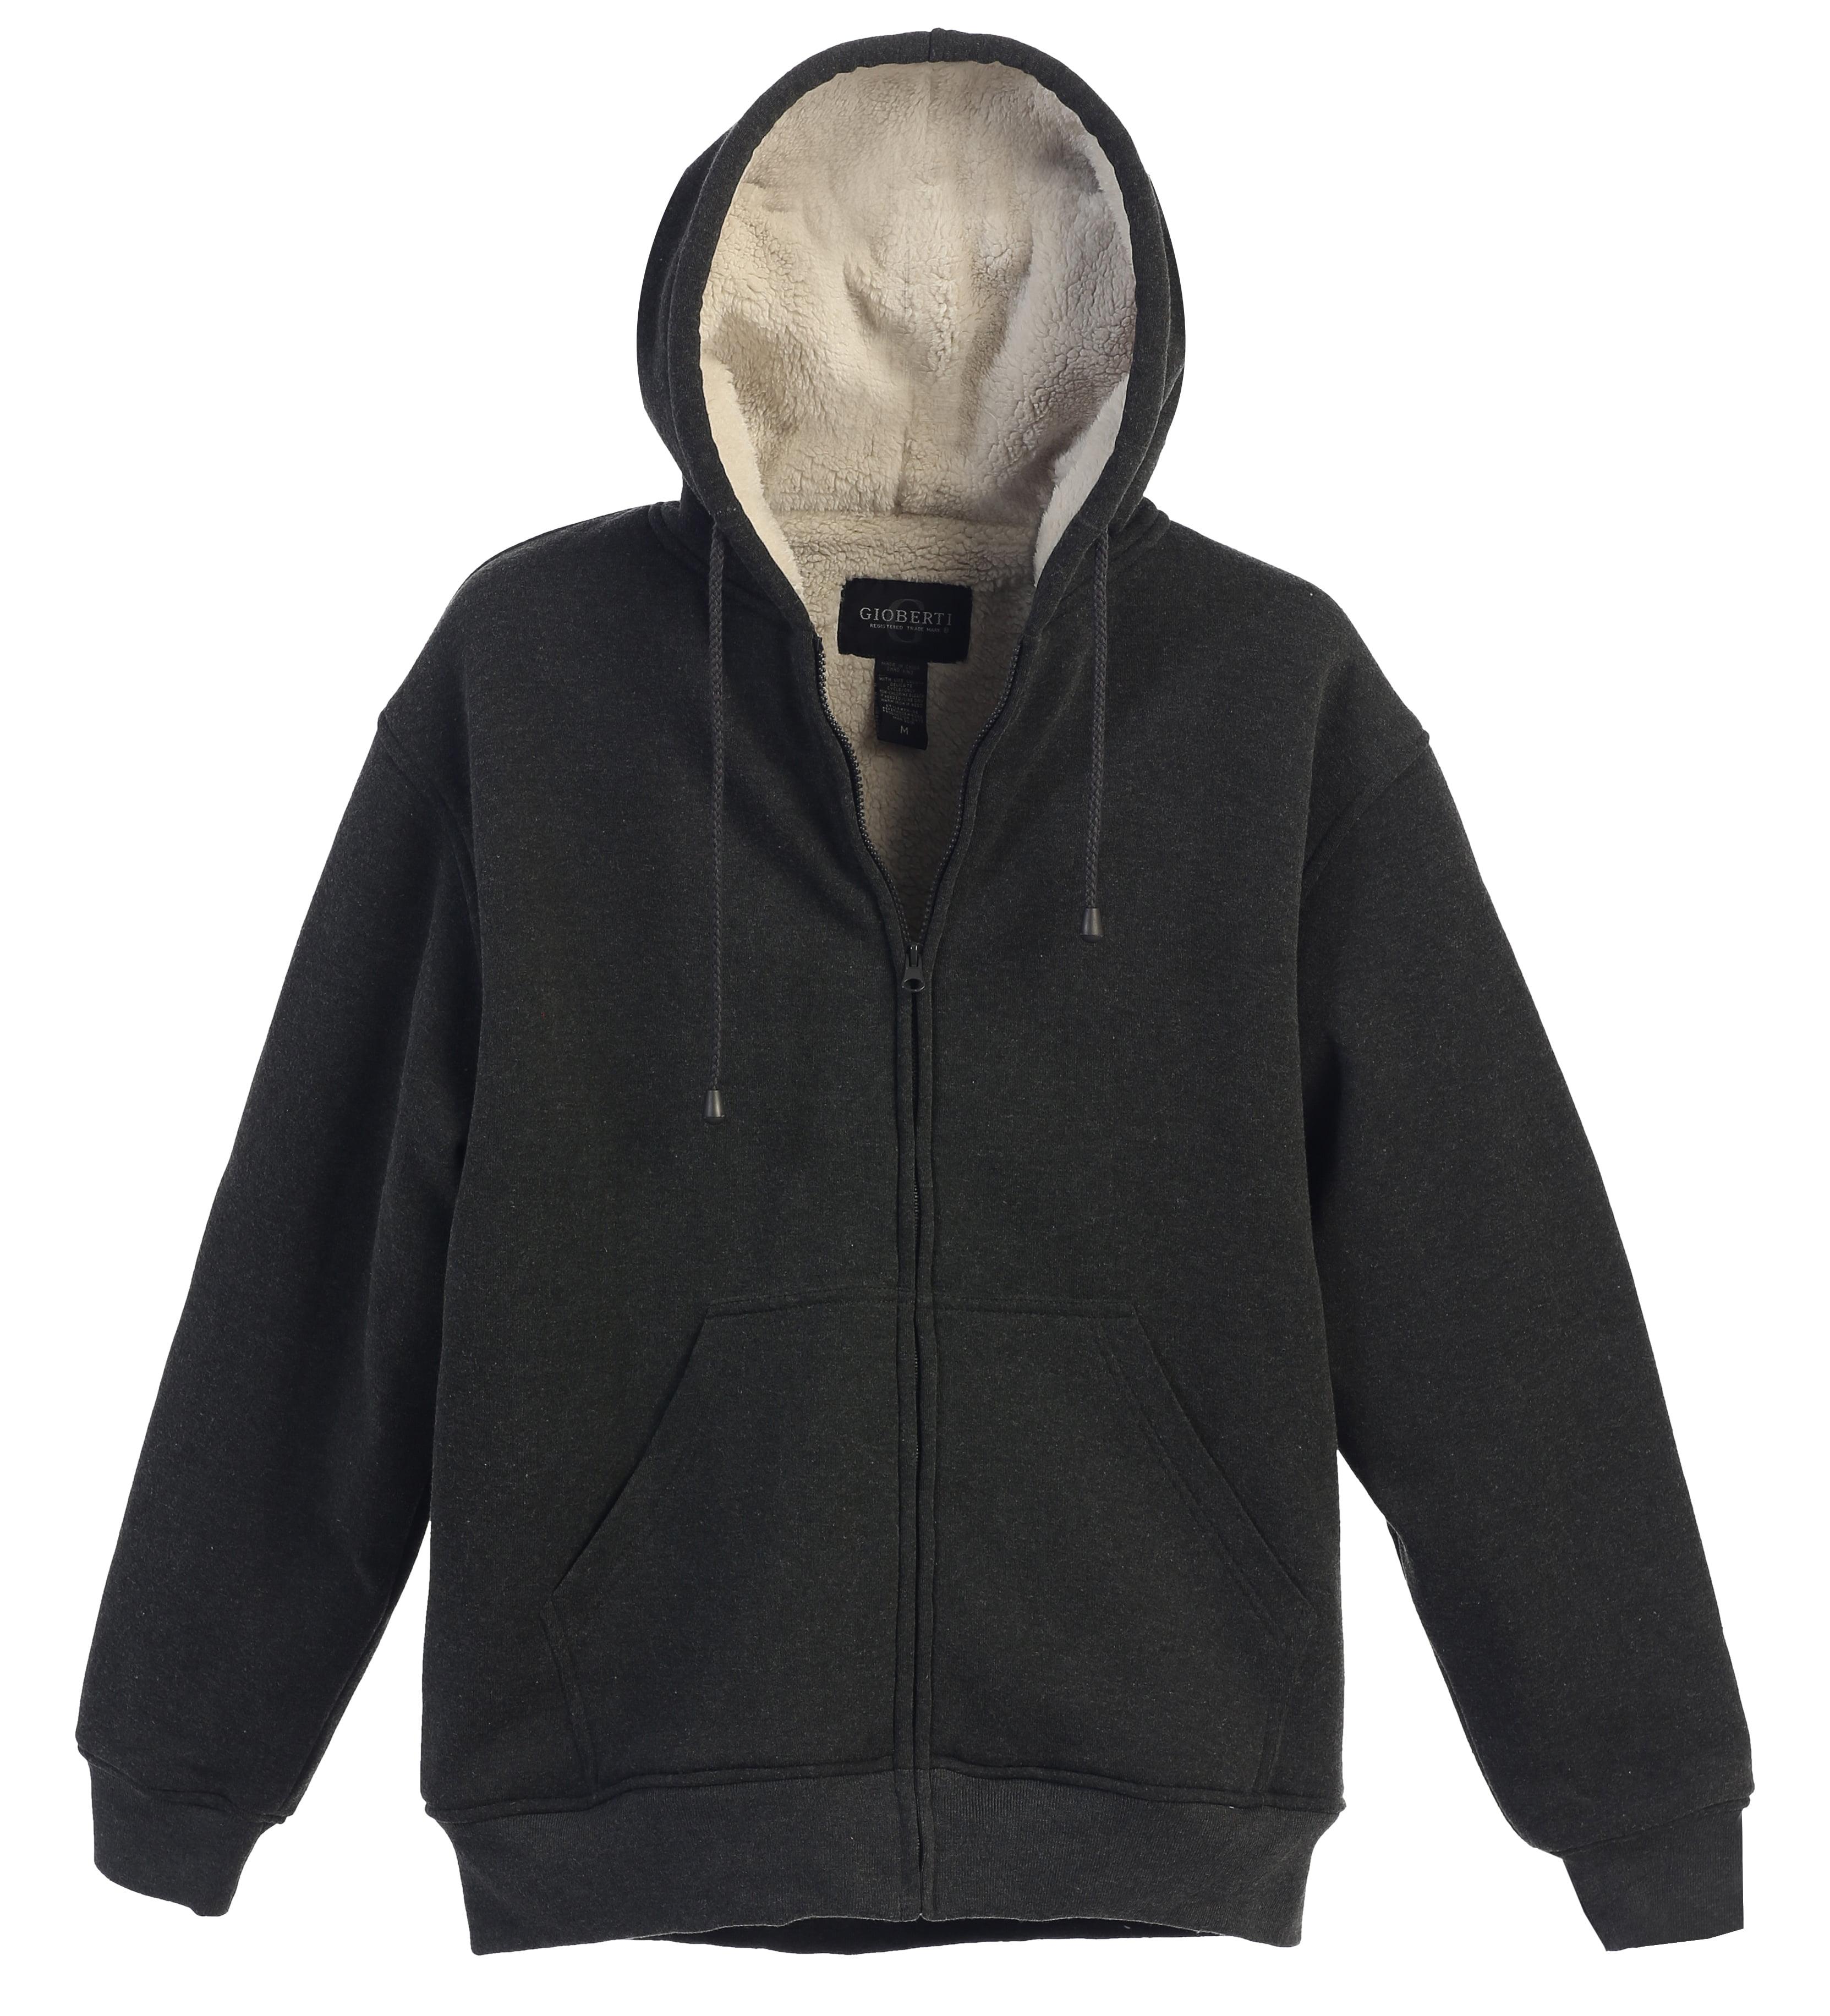 FieerMen Sweatshirt Hoodies Full Sleeve-Front Zip Premium Hood 2 Kangaroo Split Pocket Dark Grey 2XL